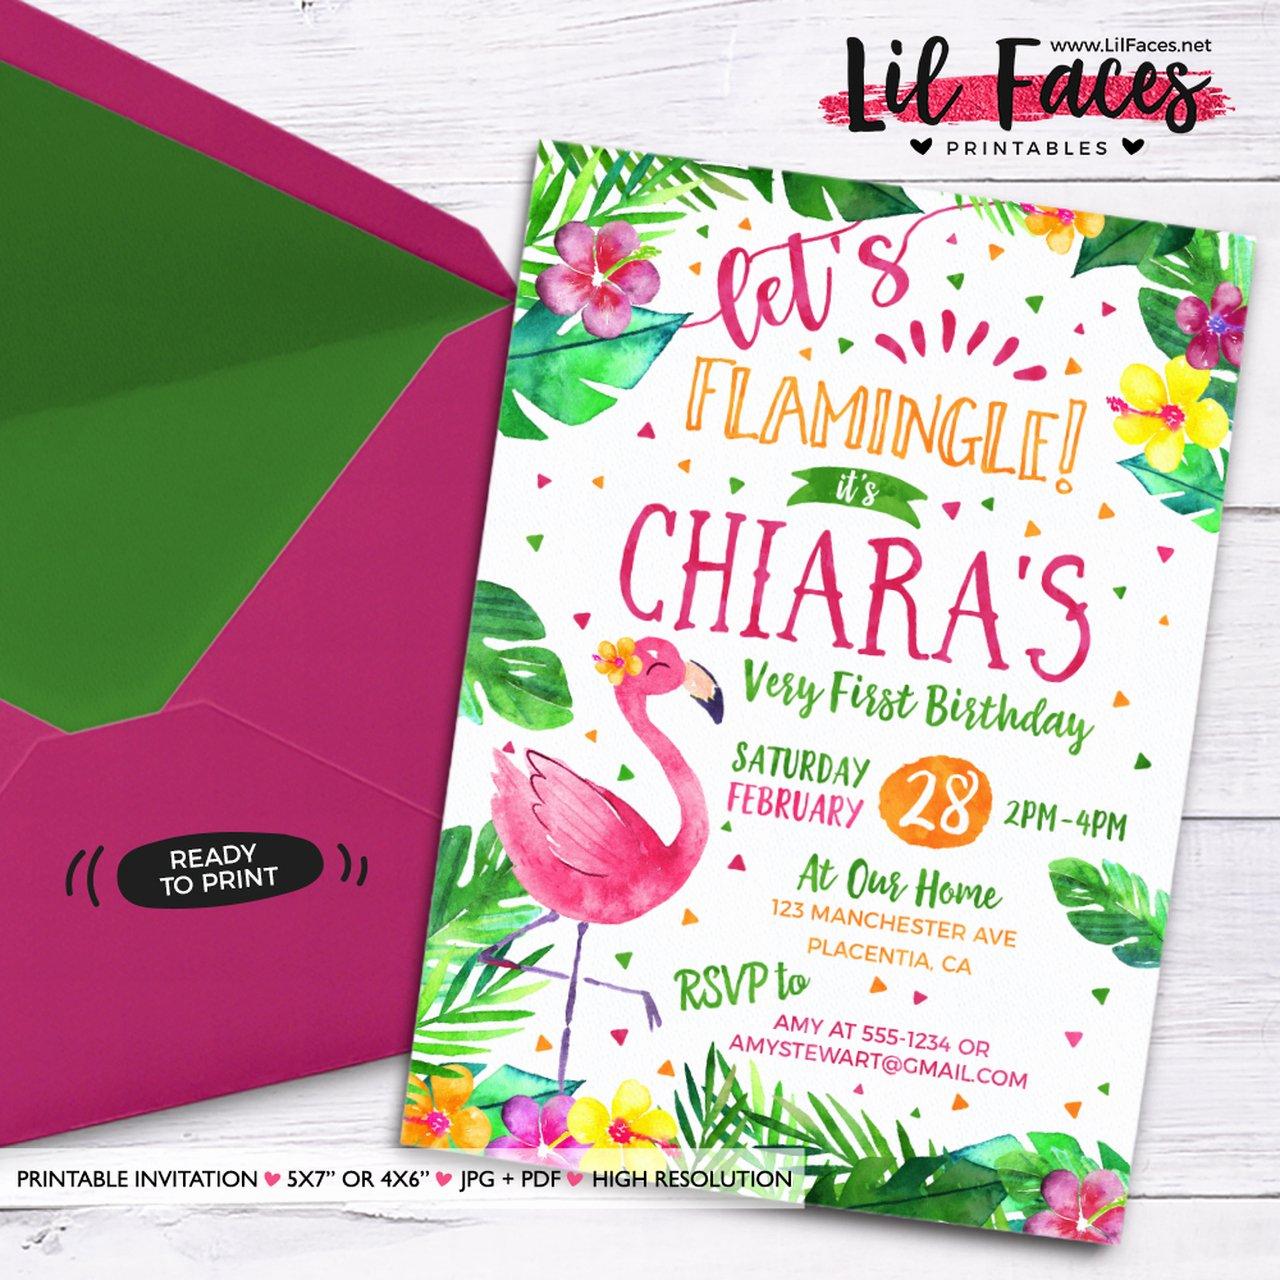 Summer Pool Party Invitations Inspirational Flamingo Birthday Invitation Flamingo Floral Invitations